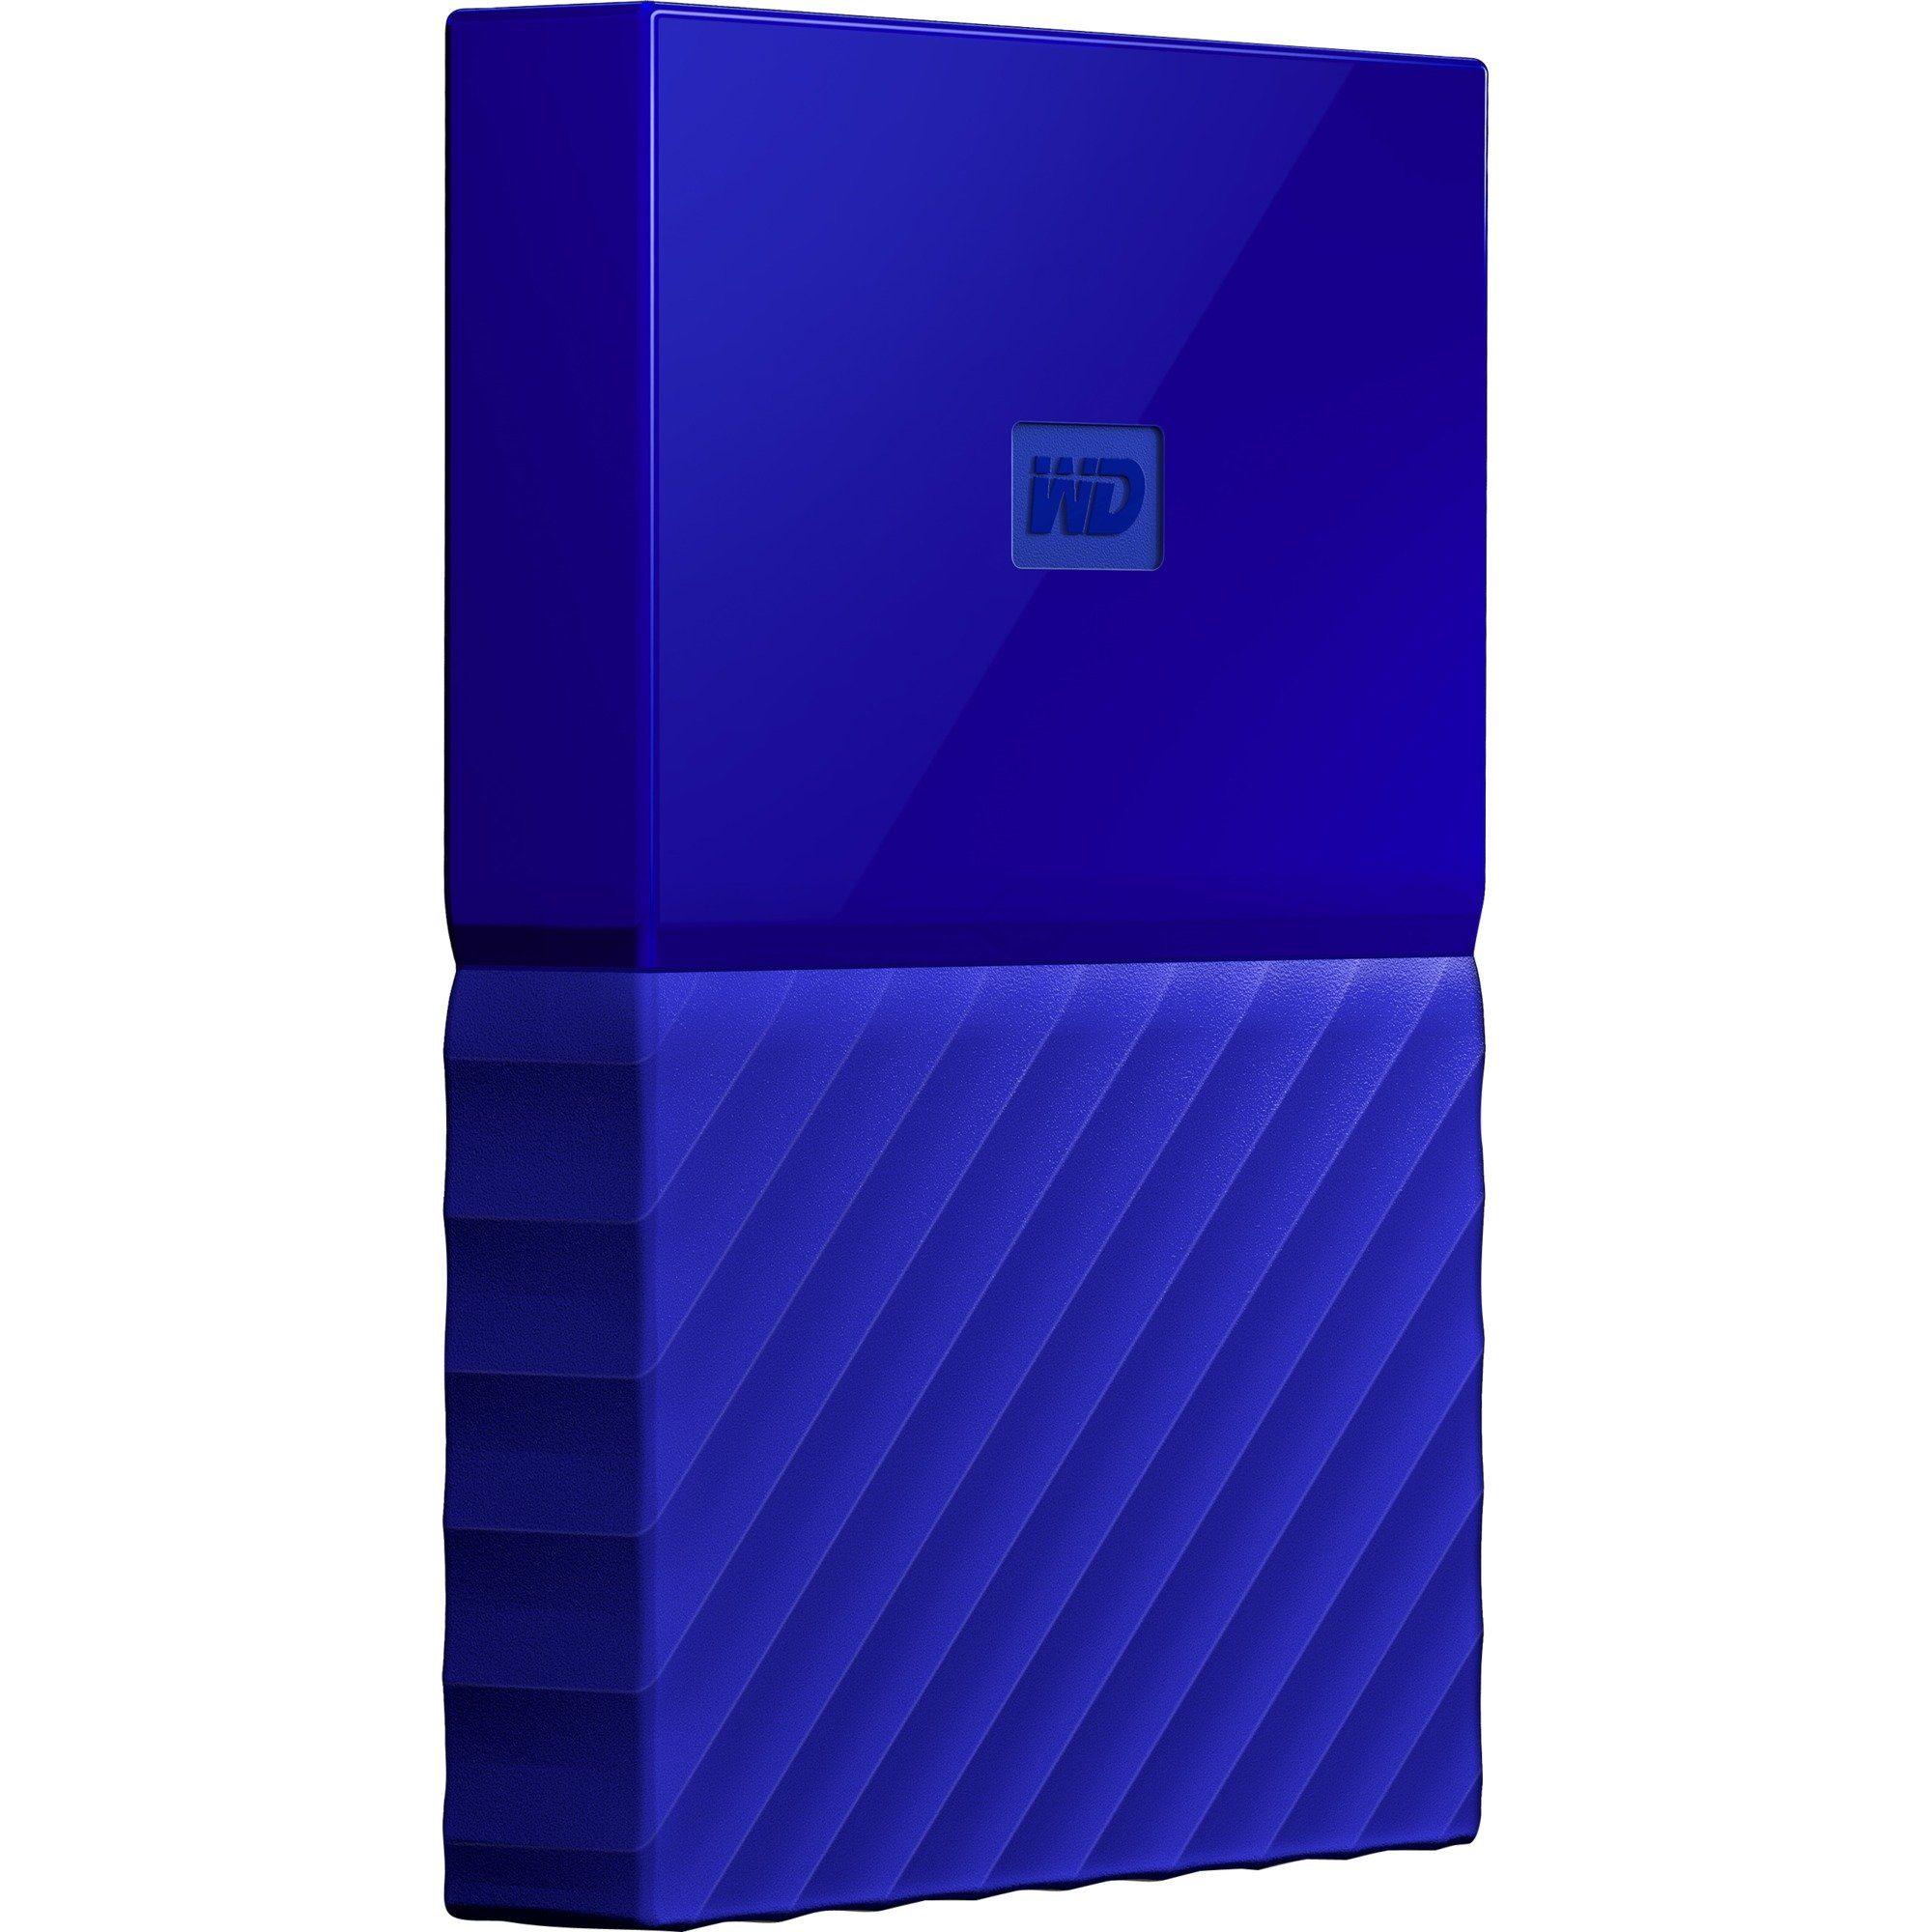 Western Digital Festplatte »My Passport 3 TB«